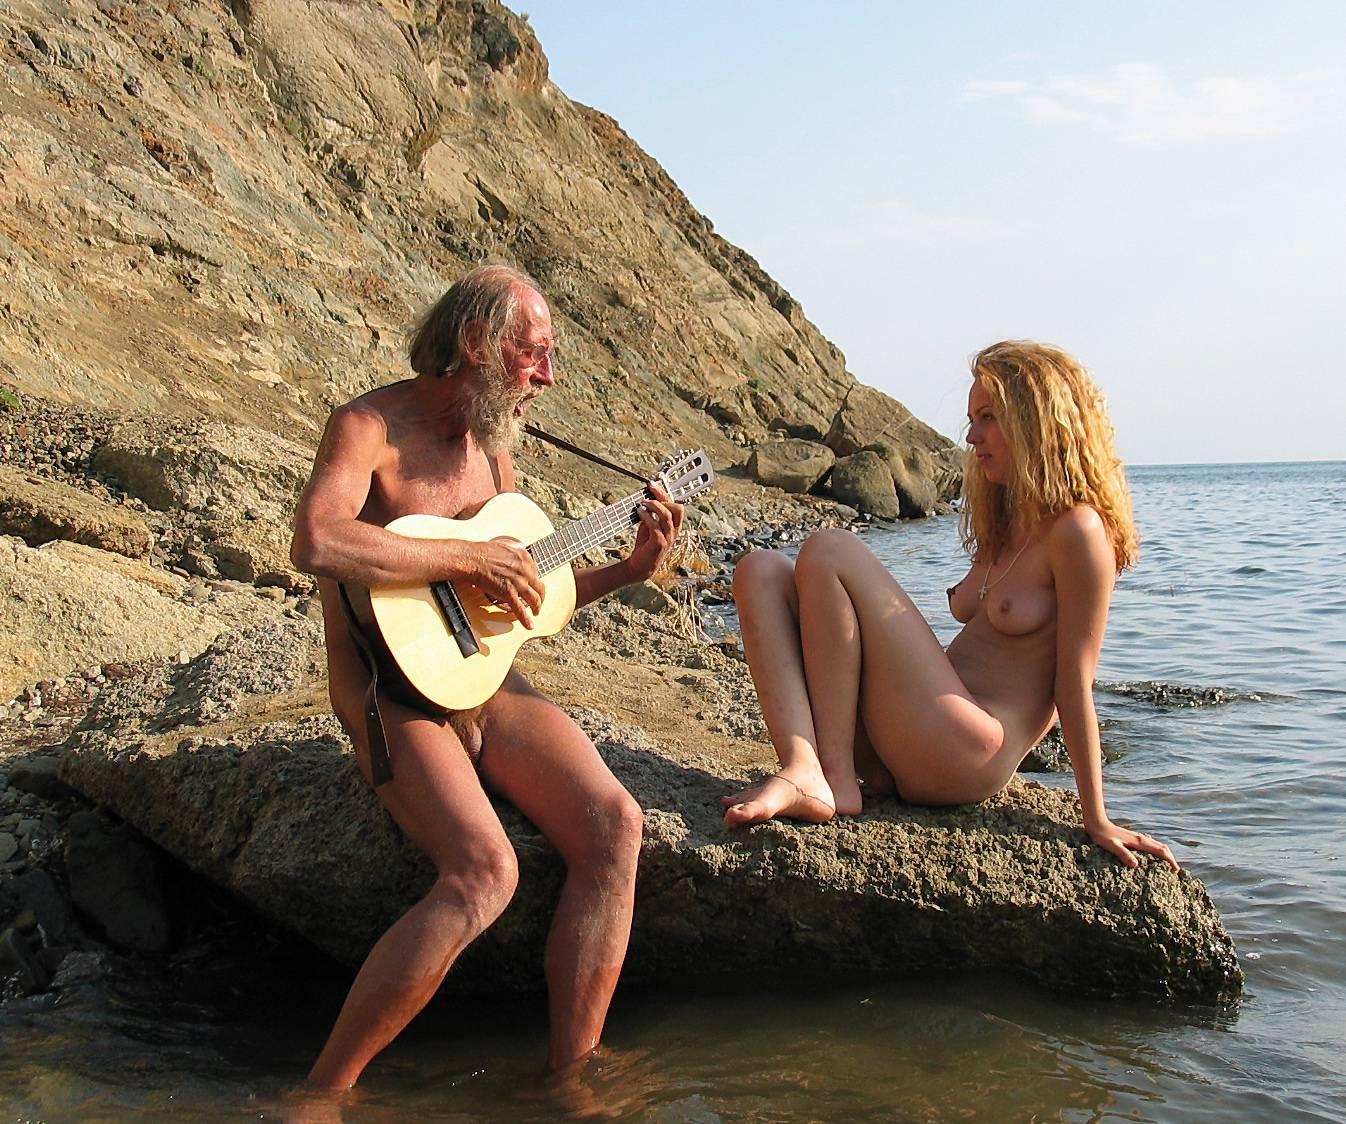 Pure Nudism Photos-Guitarists Beach Tunes - 1